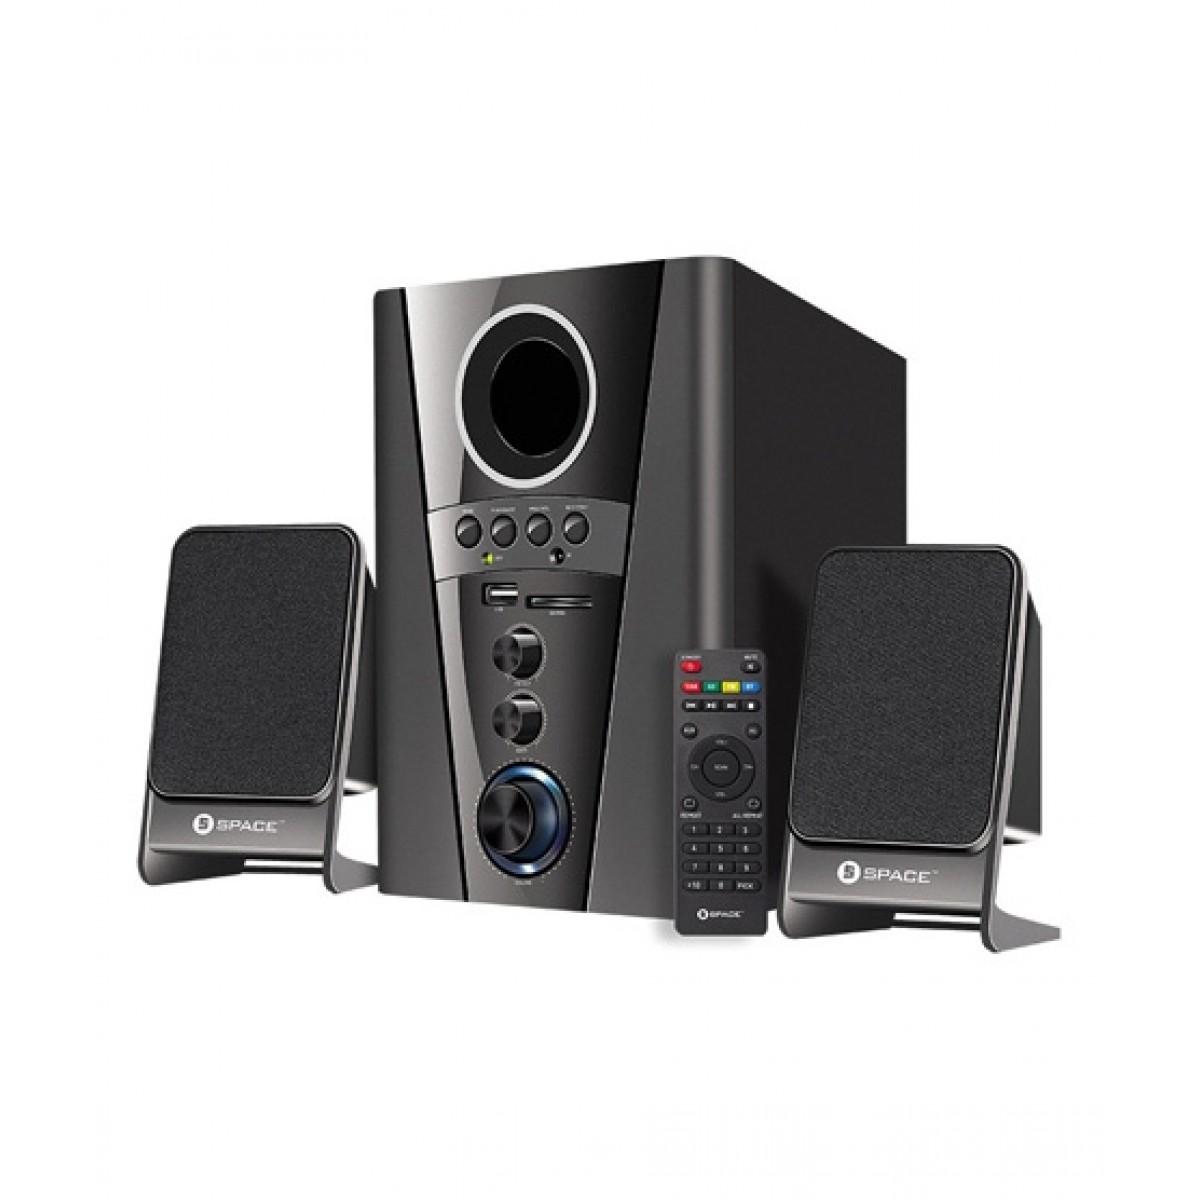 Space Ap924 Amplify Bluetooth Speaker System Price In Pakistan